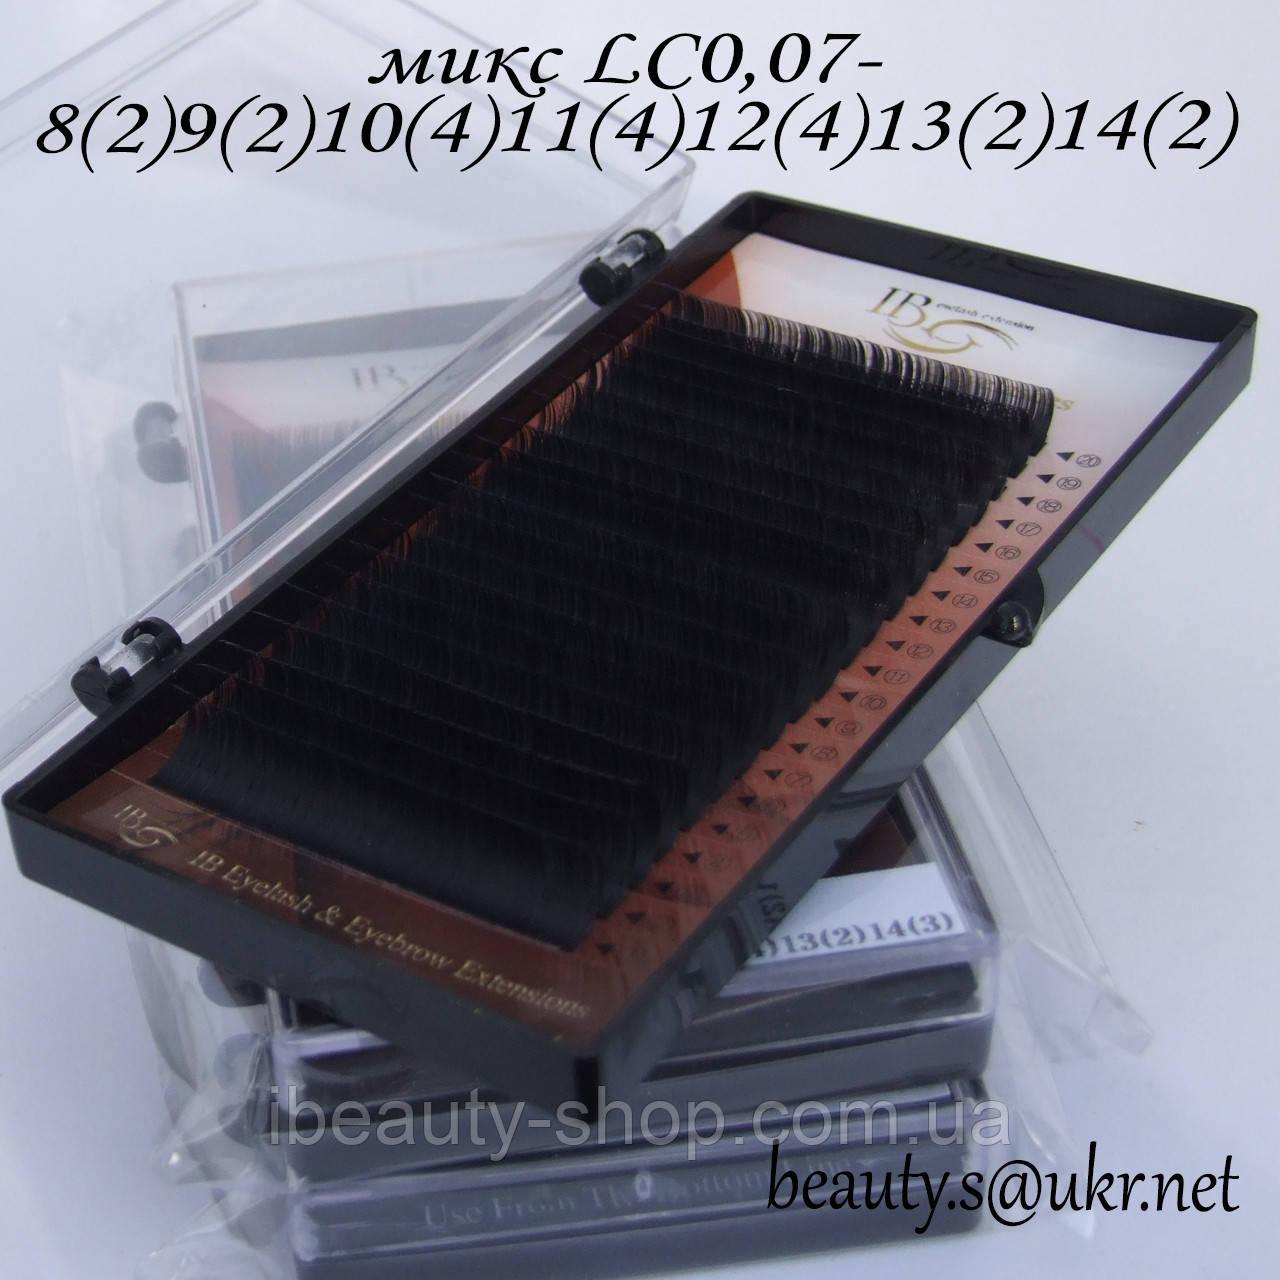 Ресницы I-Beauty микс LC-0,07 8-14мм